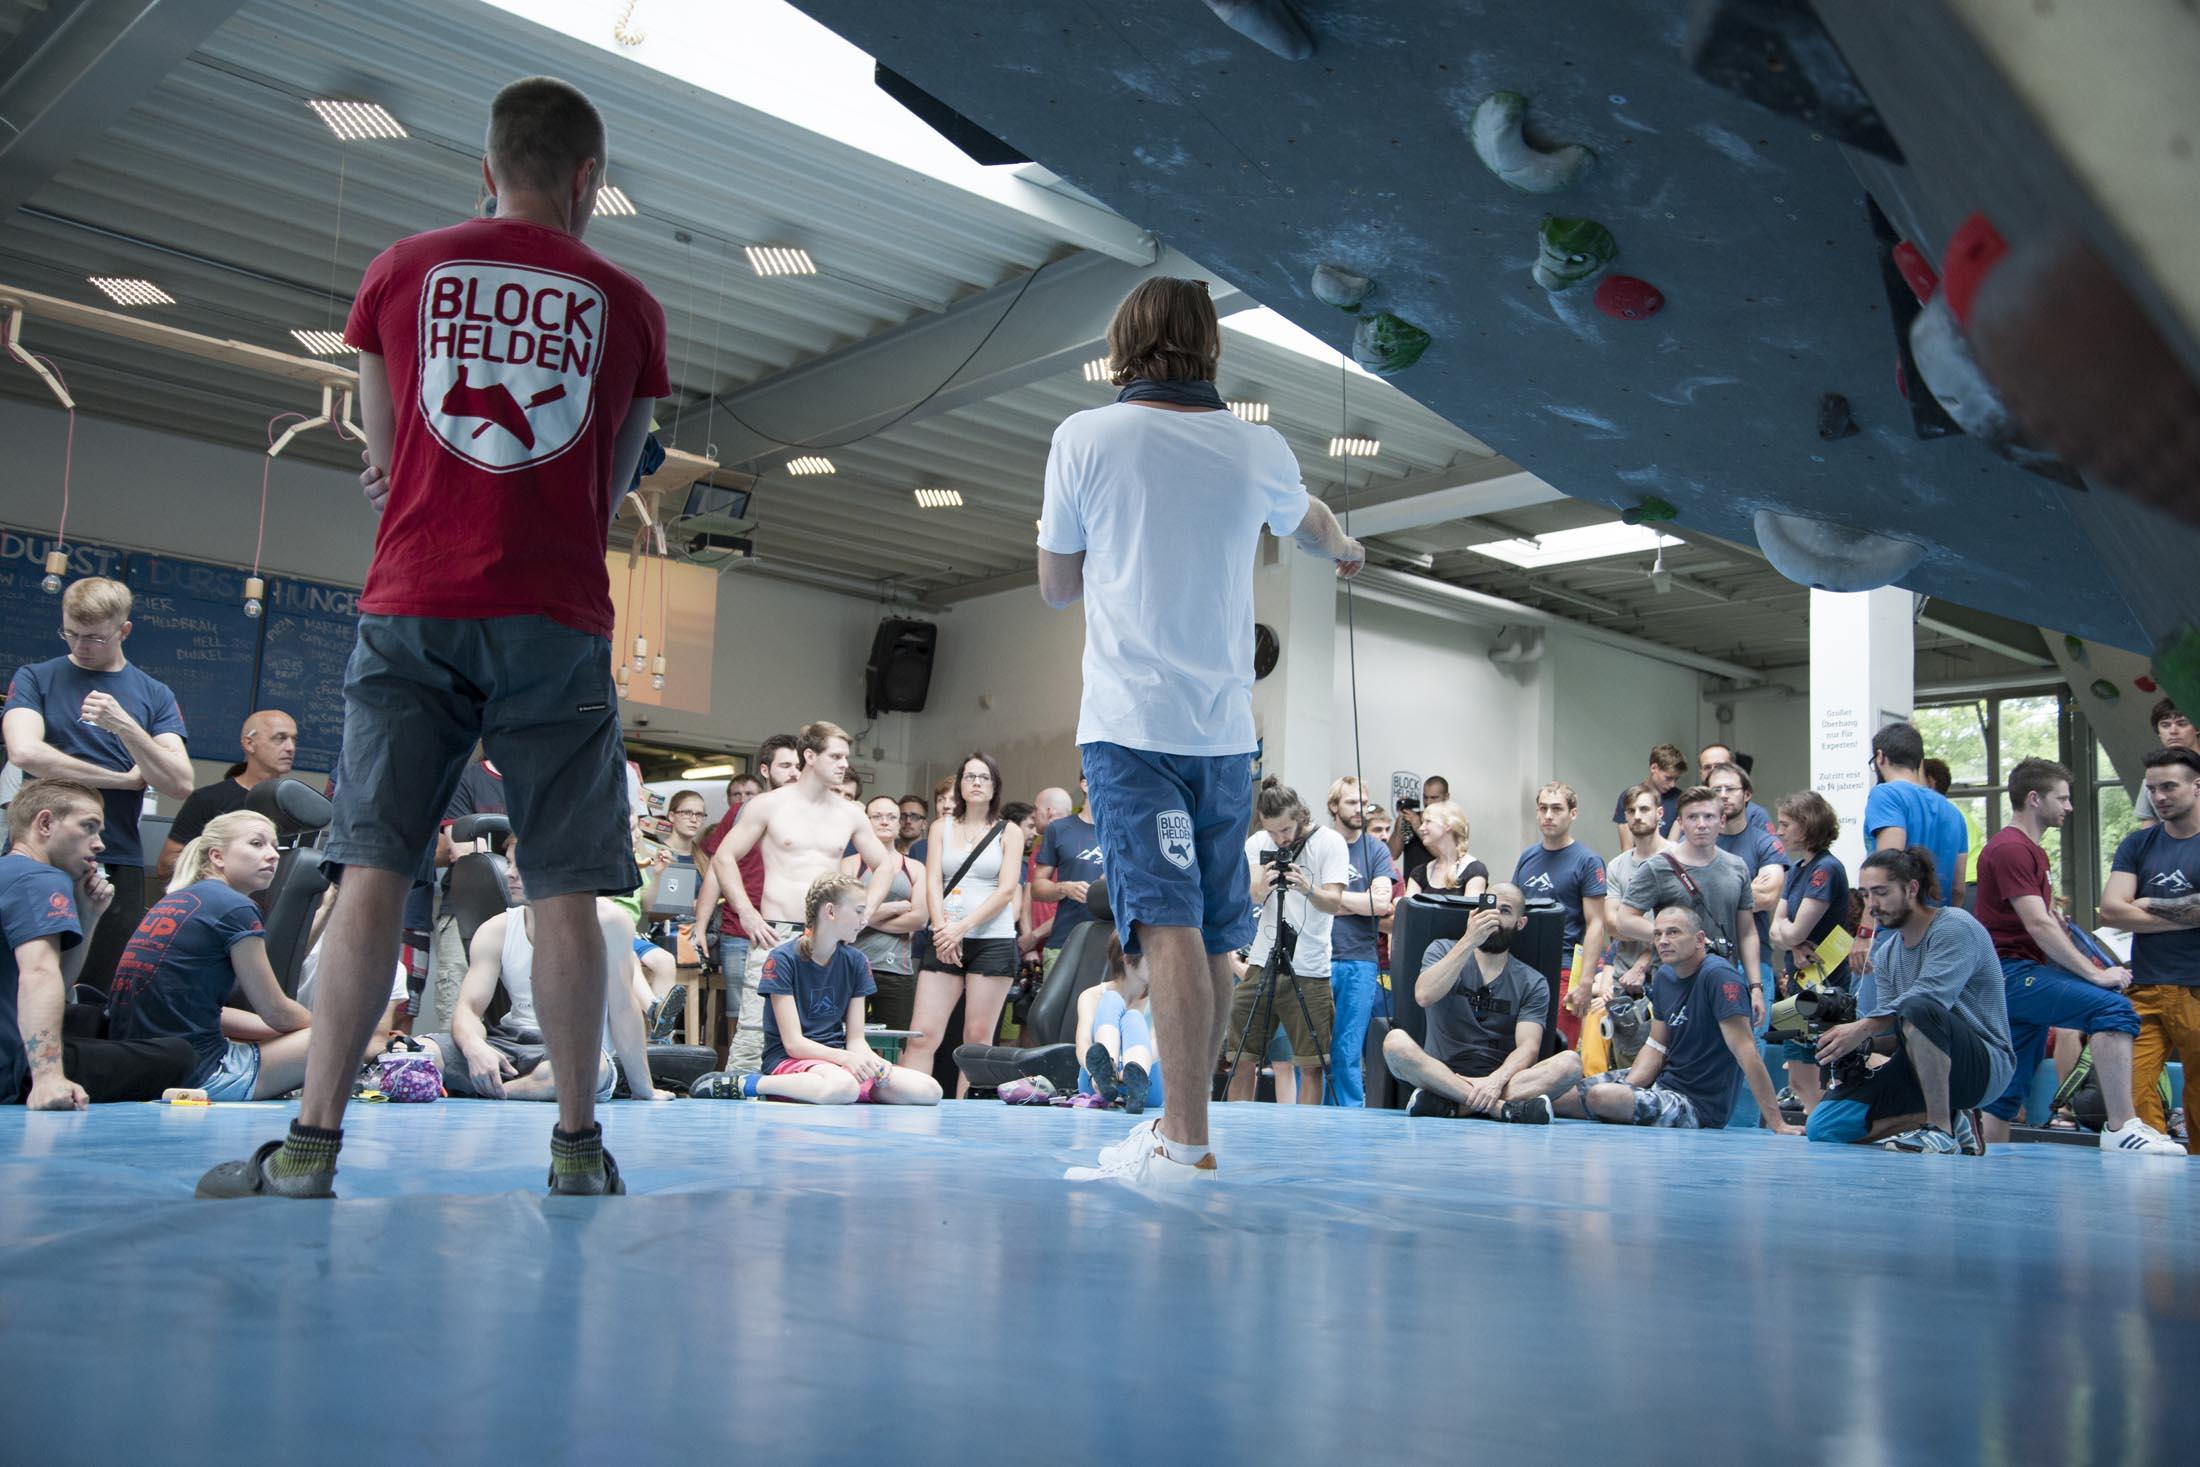 Registration internationaler bouldercup Frankenjura 2016, BLOCKHELDEN Erlangen, Mammut, Bergfreunde.de, Boulderwettkampf07092016092